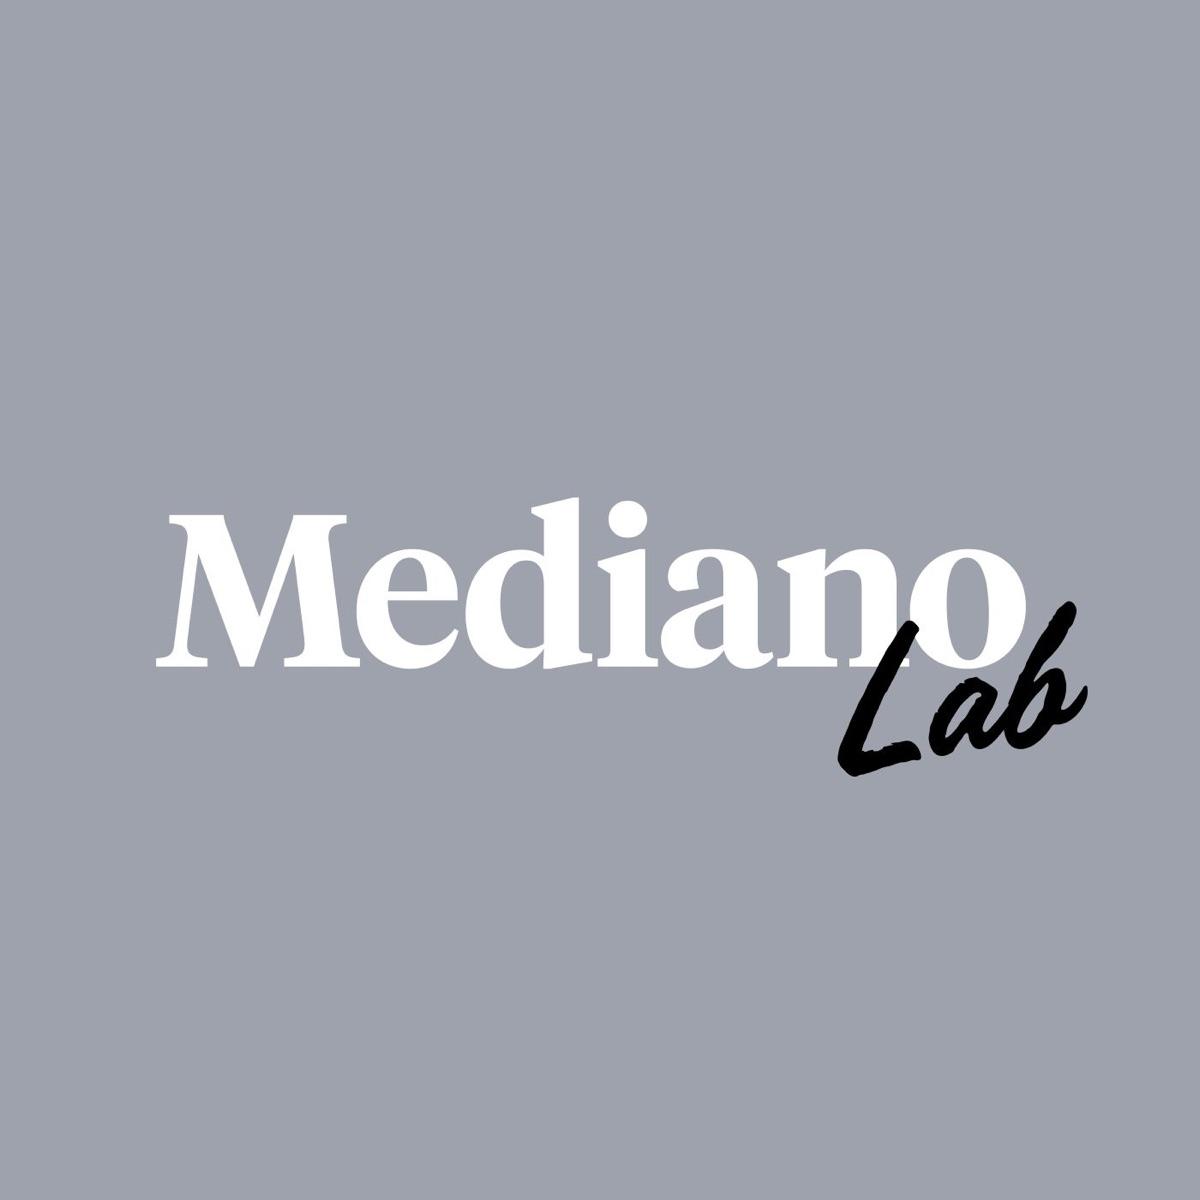 Mediano Lab